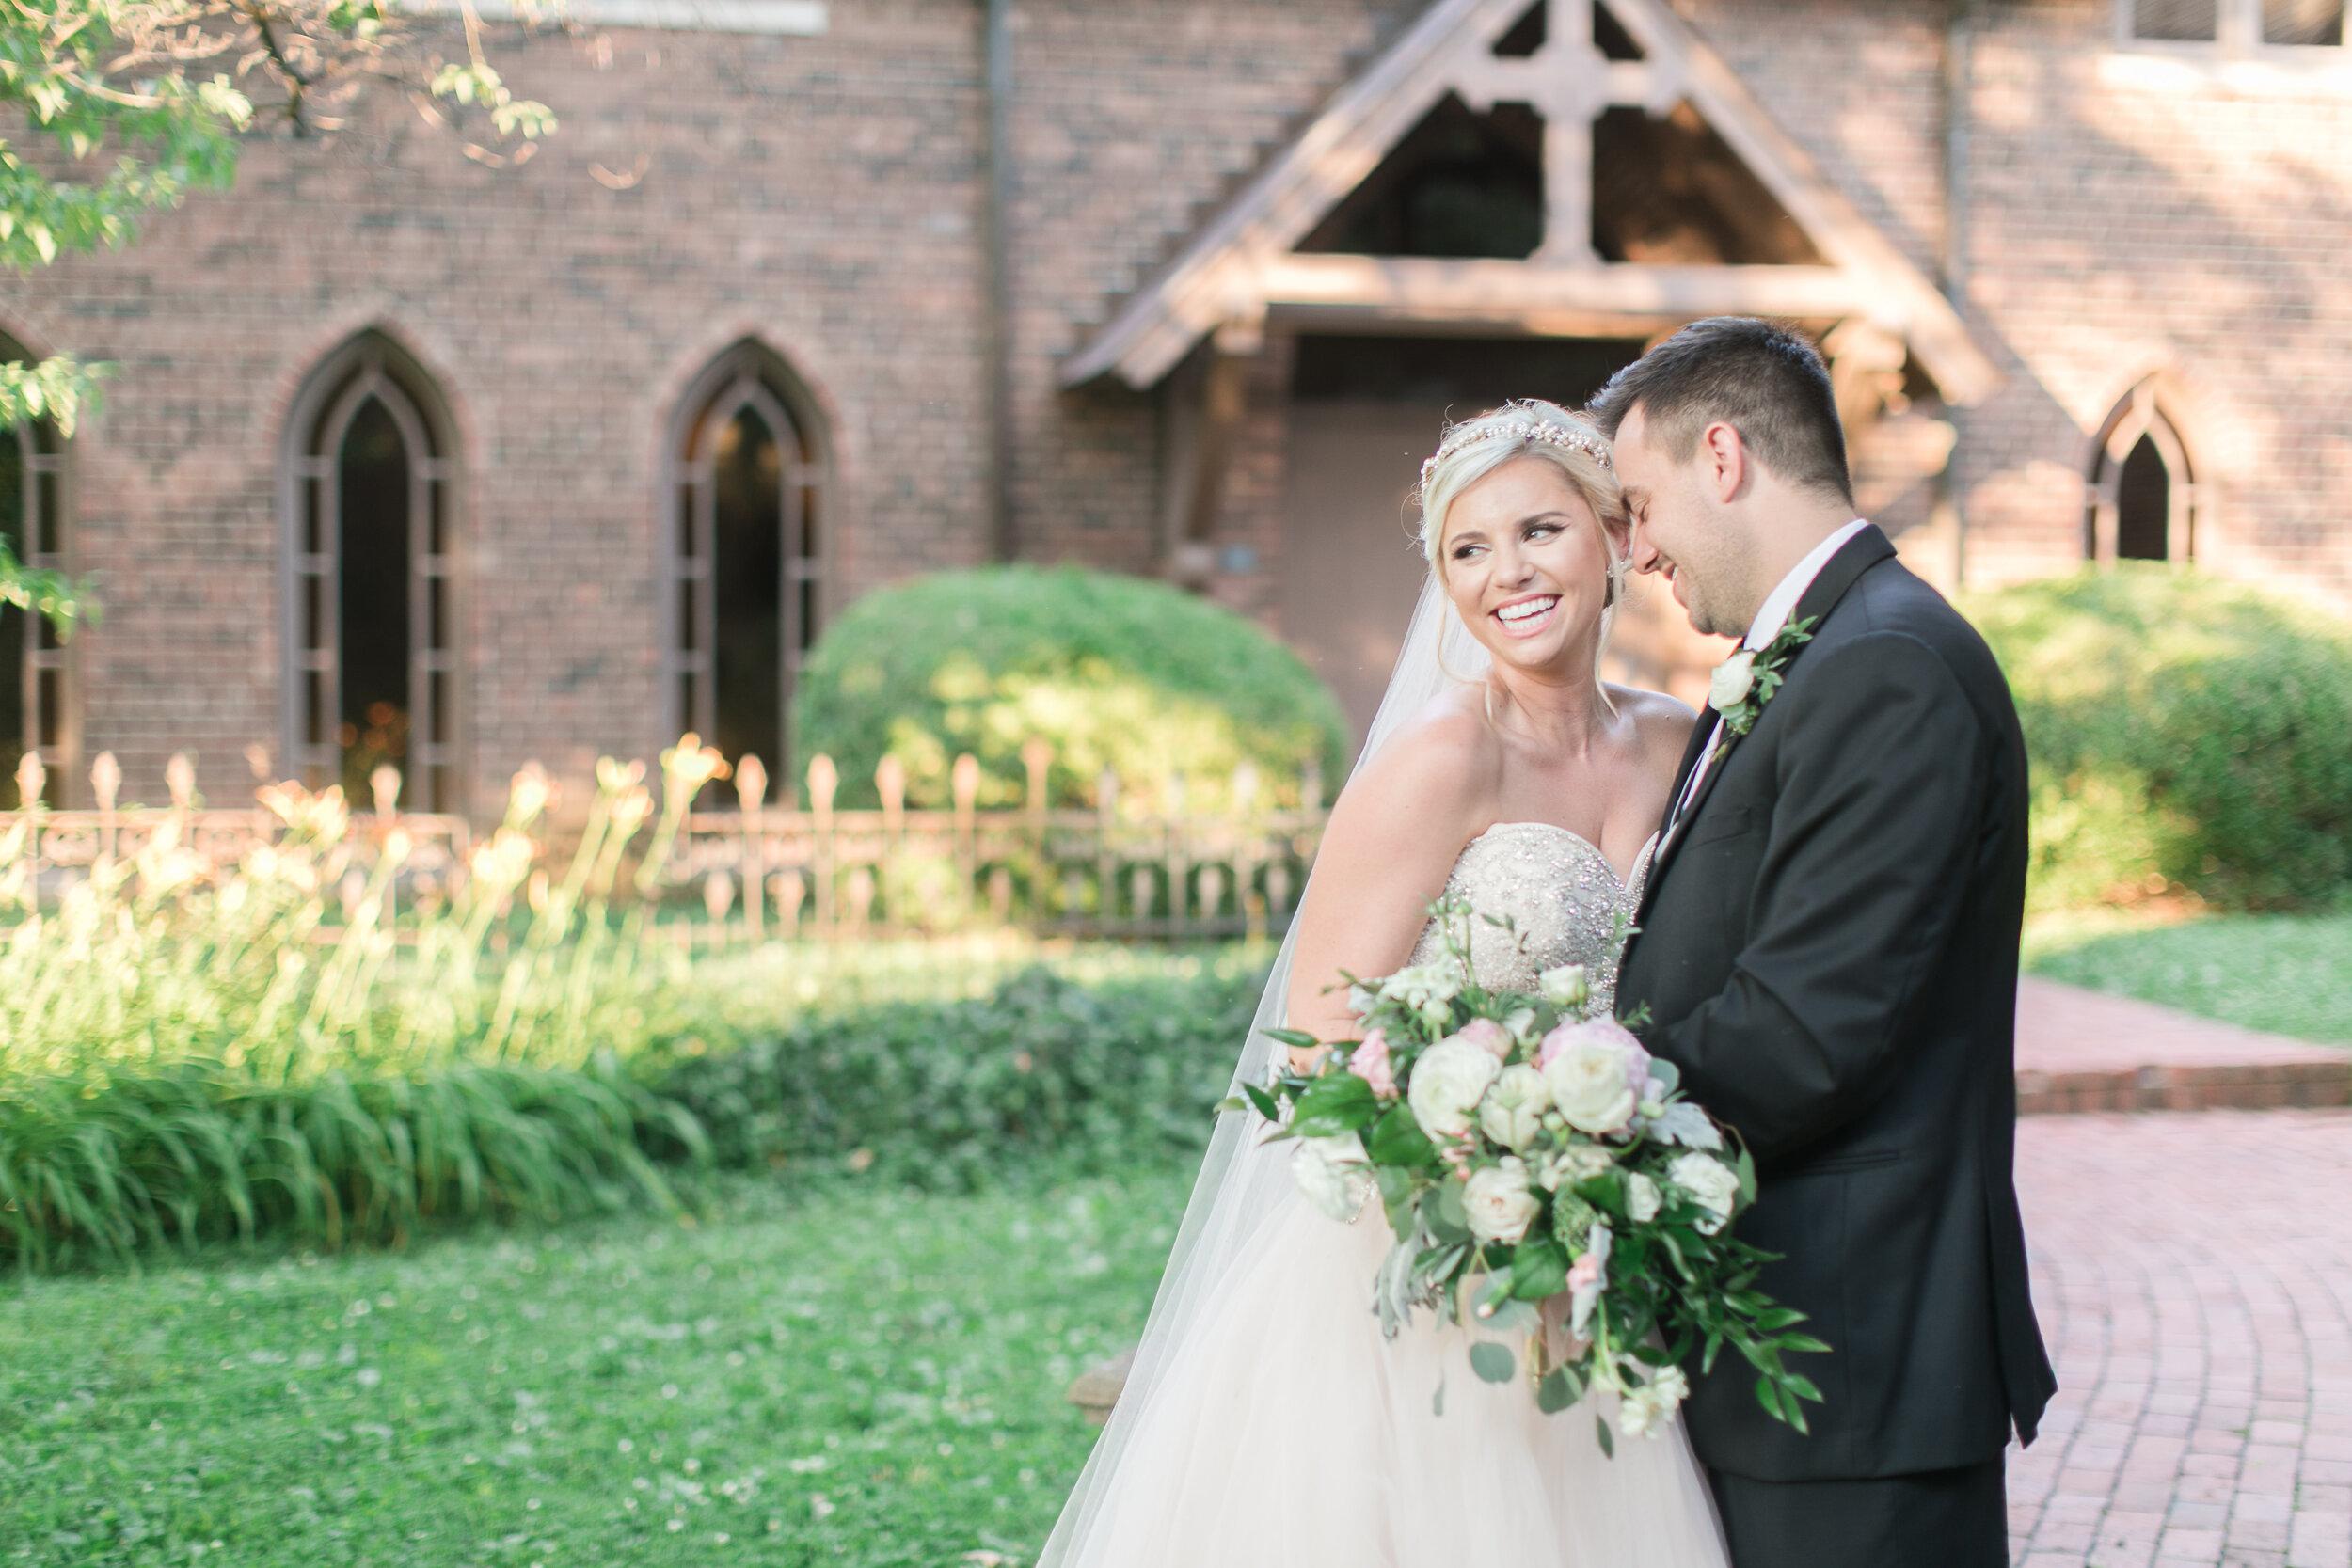 Holly-David-wedding-485 (1).jpg